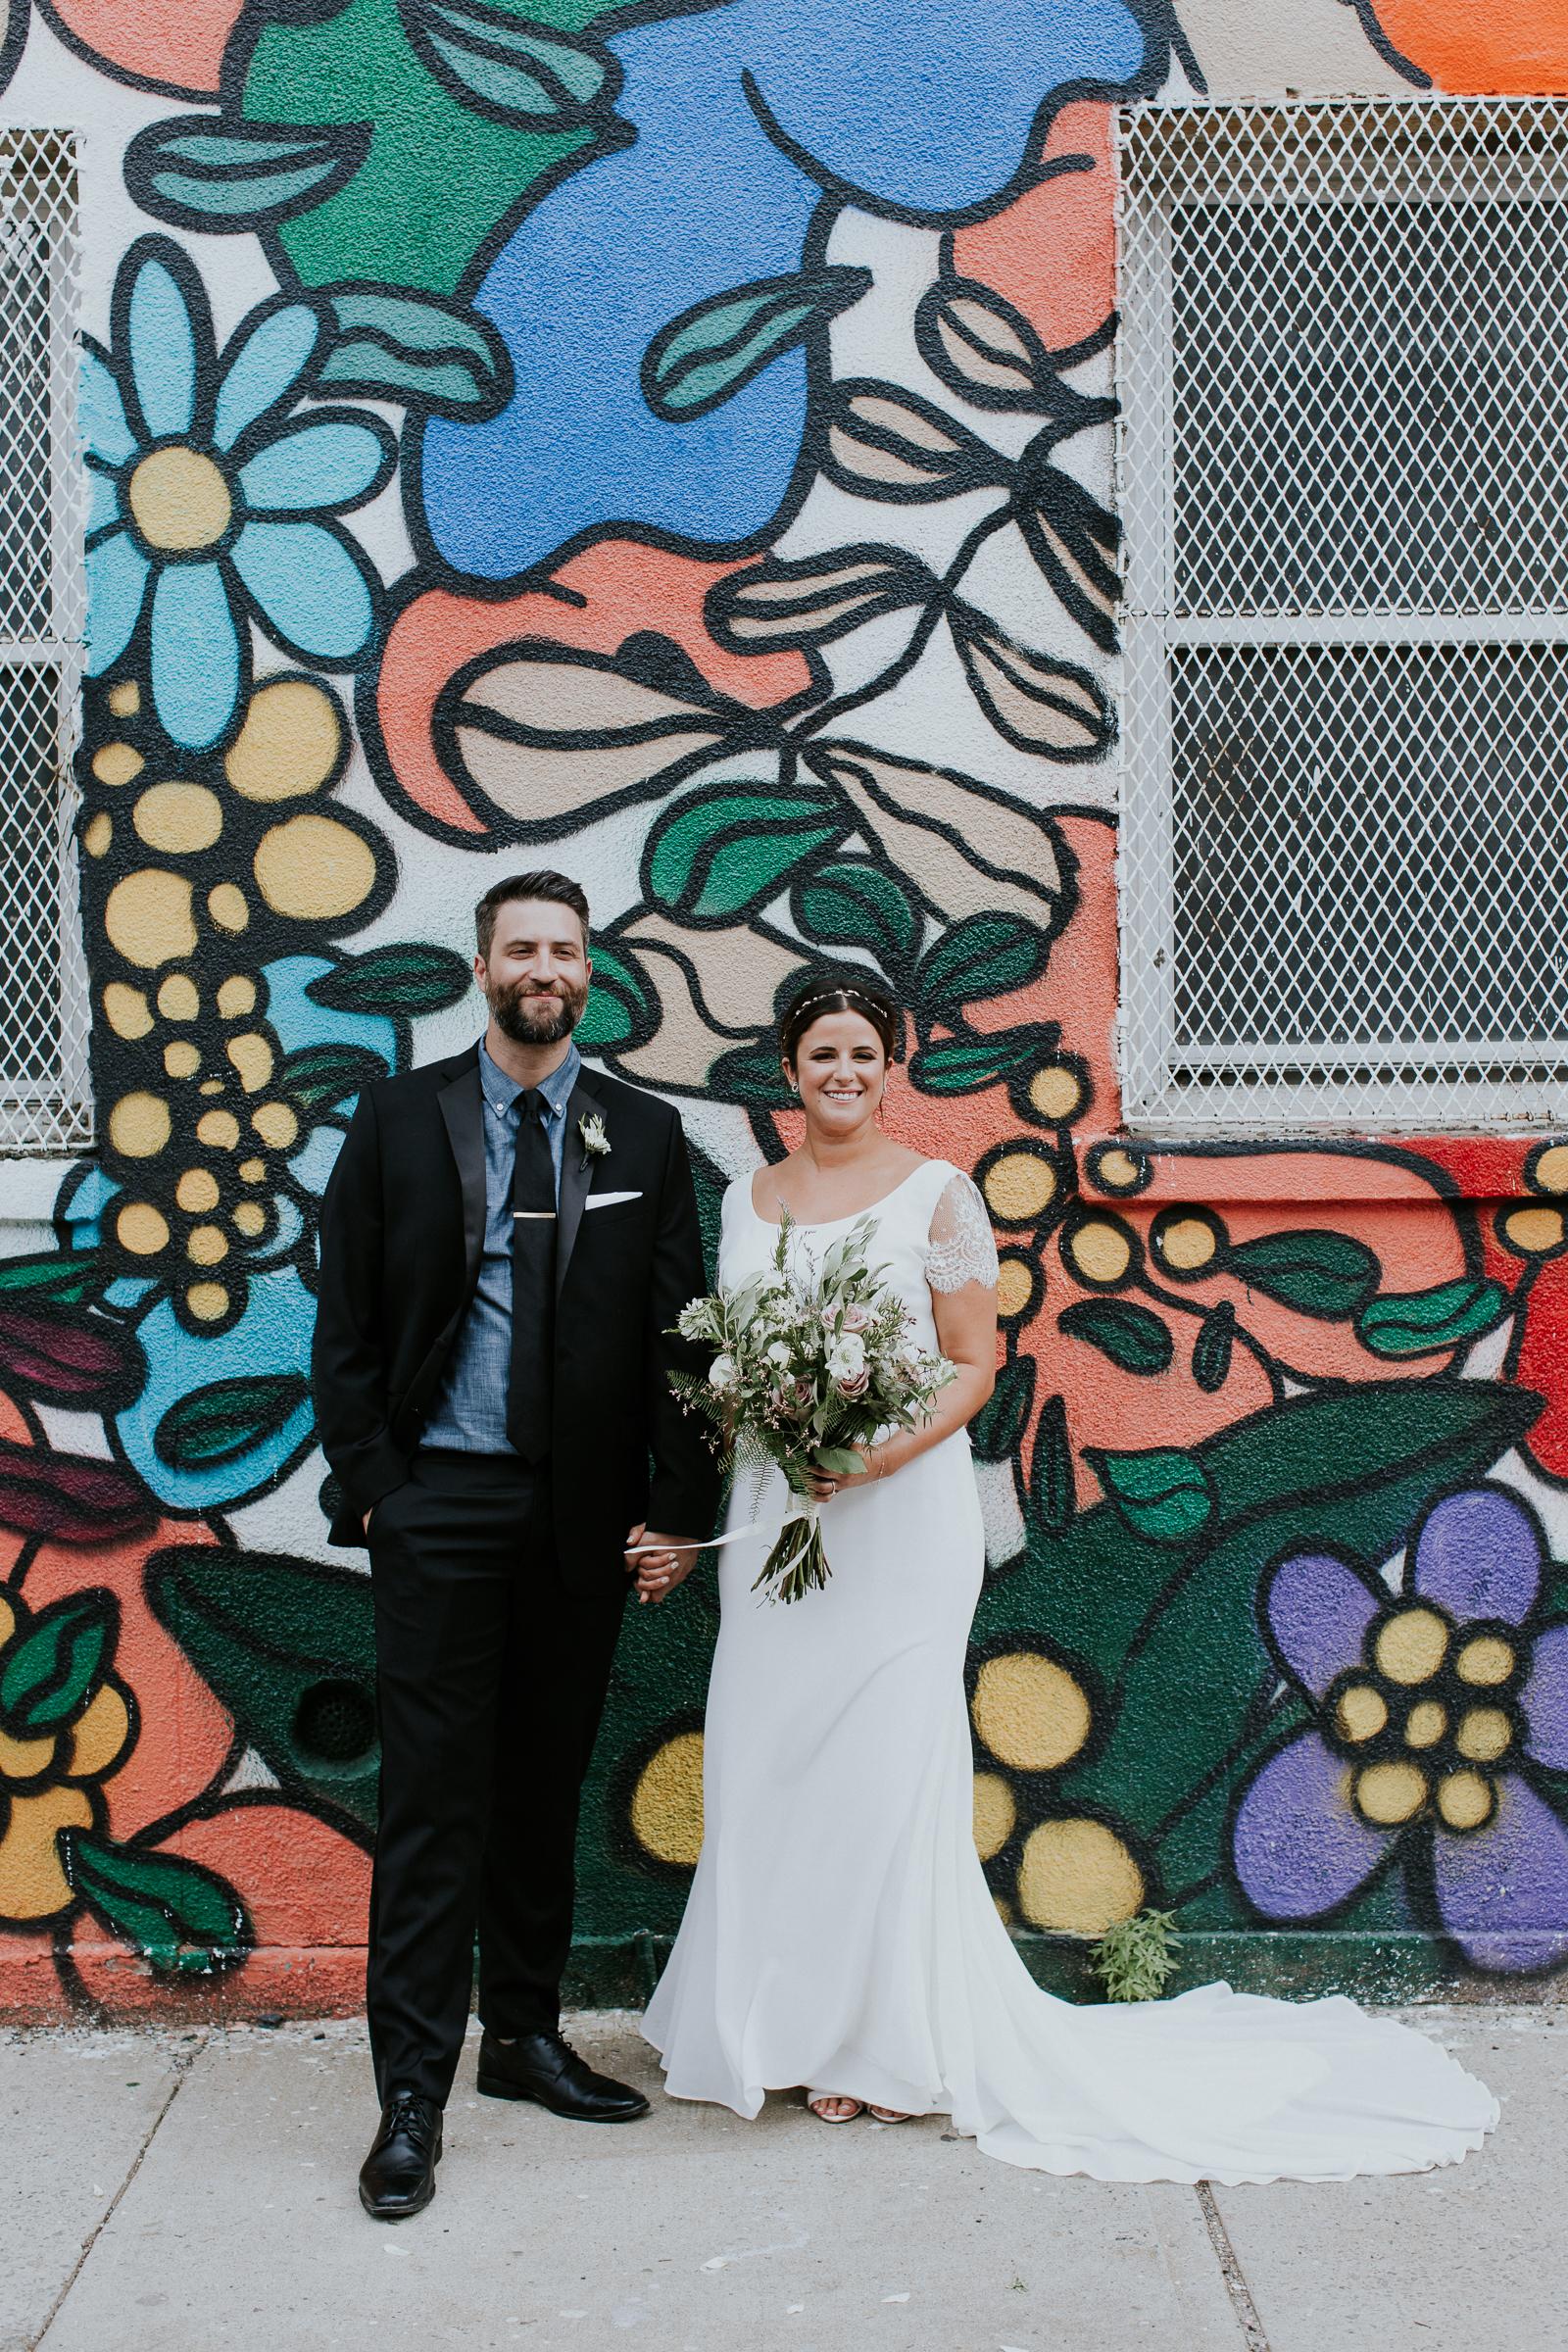 501-Union-Brooklyn-Fine-Art-Documentary-Wedding-Photographer-46.jpg